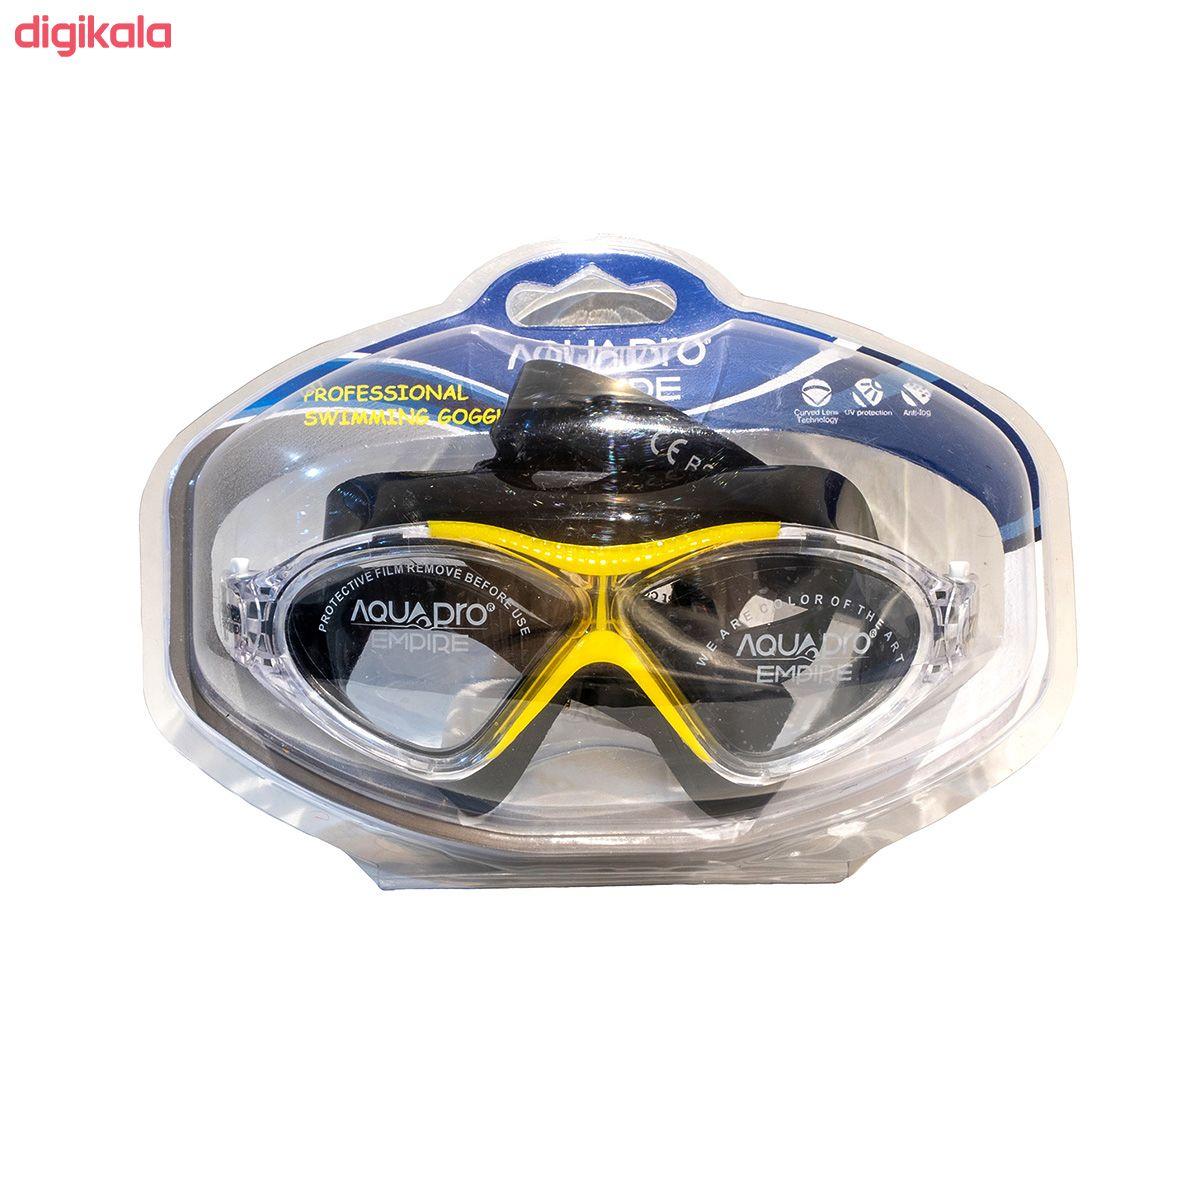 عینک شنا اکوا پرو مدل X7 main 1 8